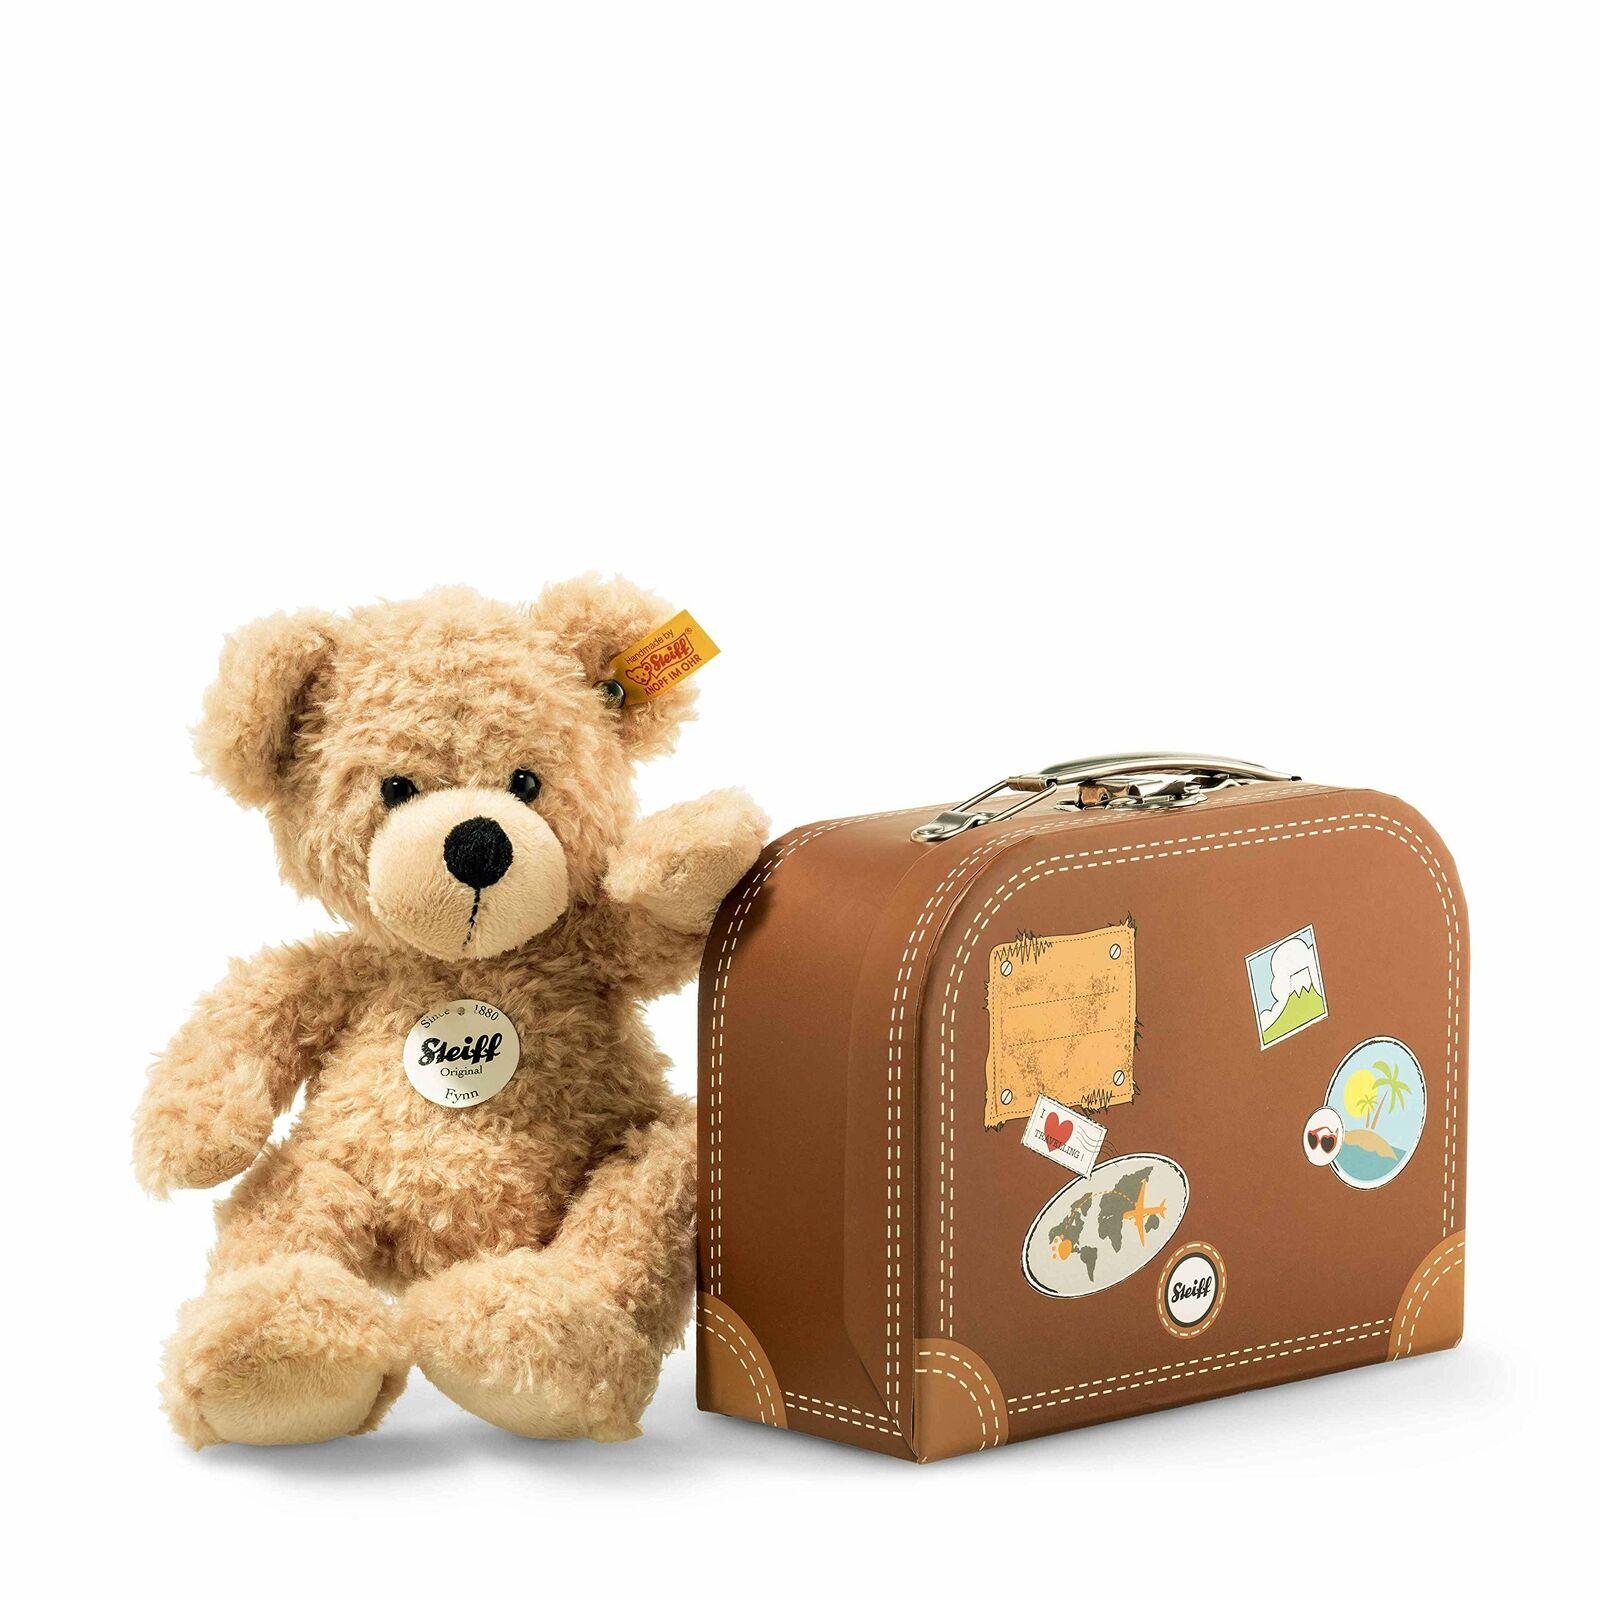 Teddy Bear fin suitcase 28cm s From japan japan